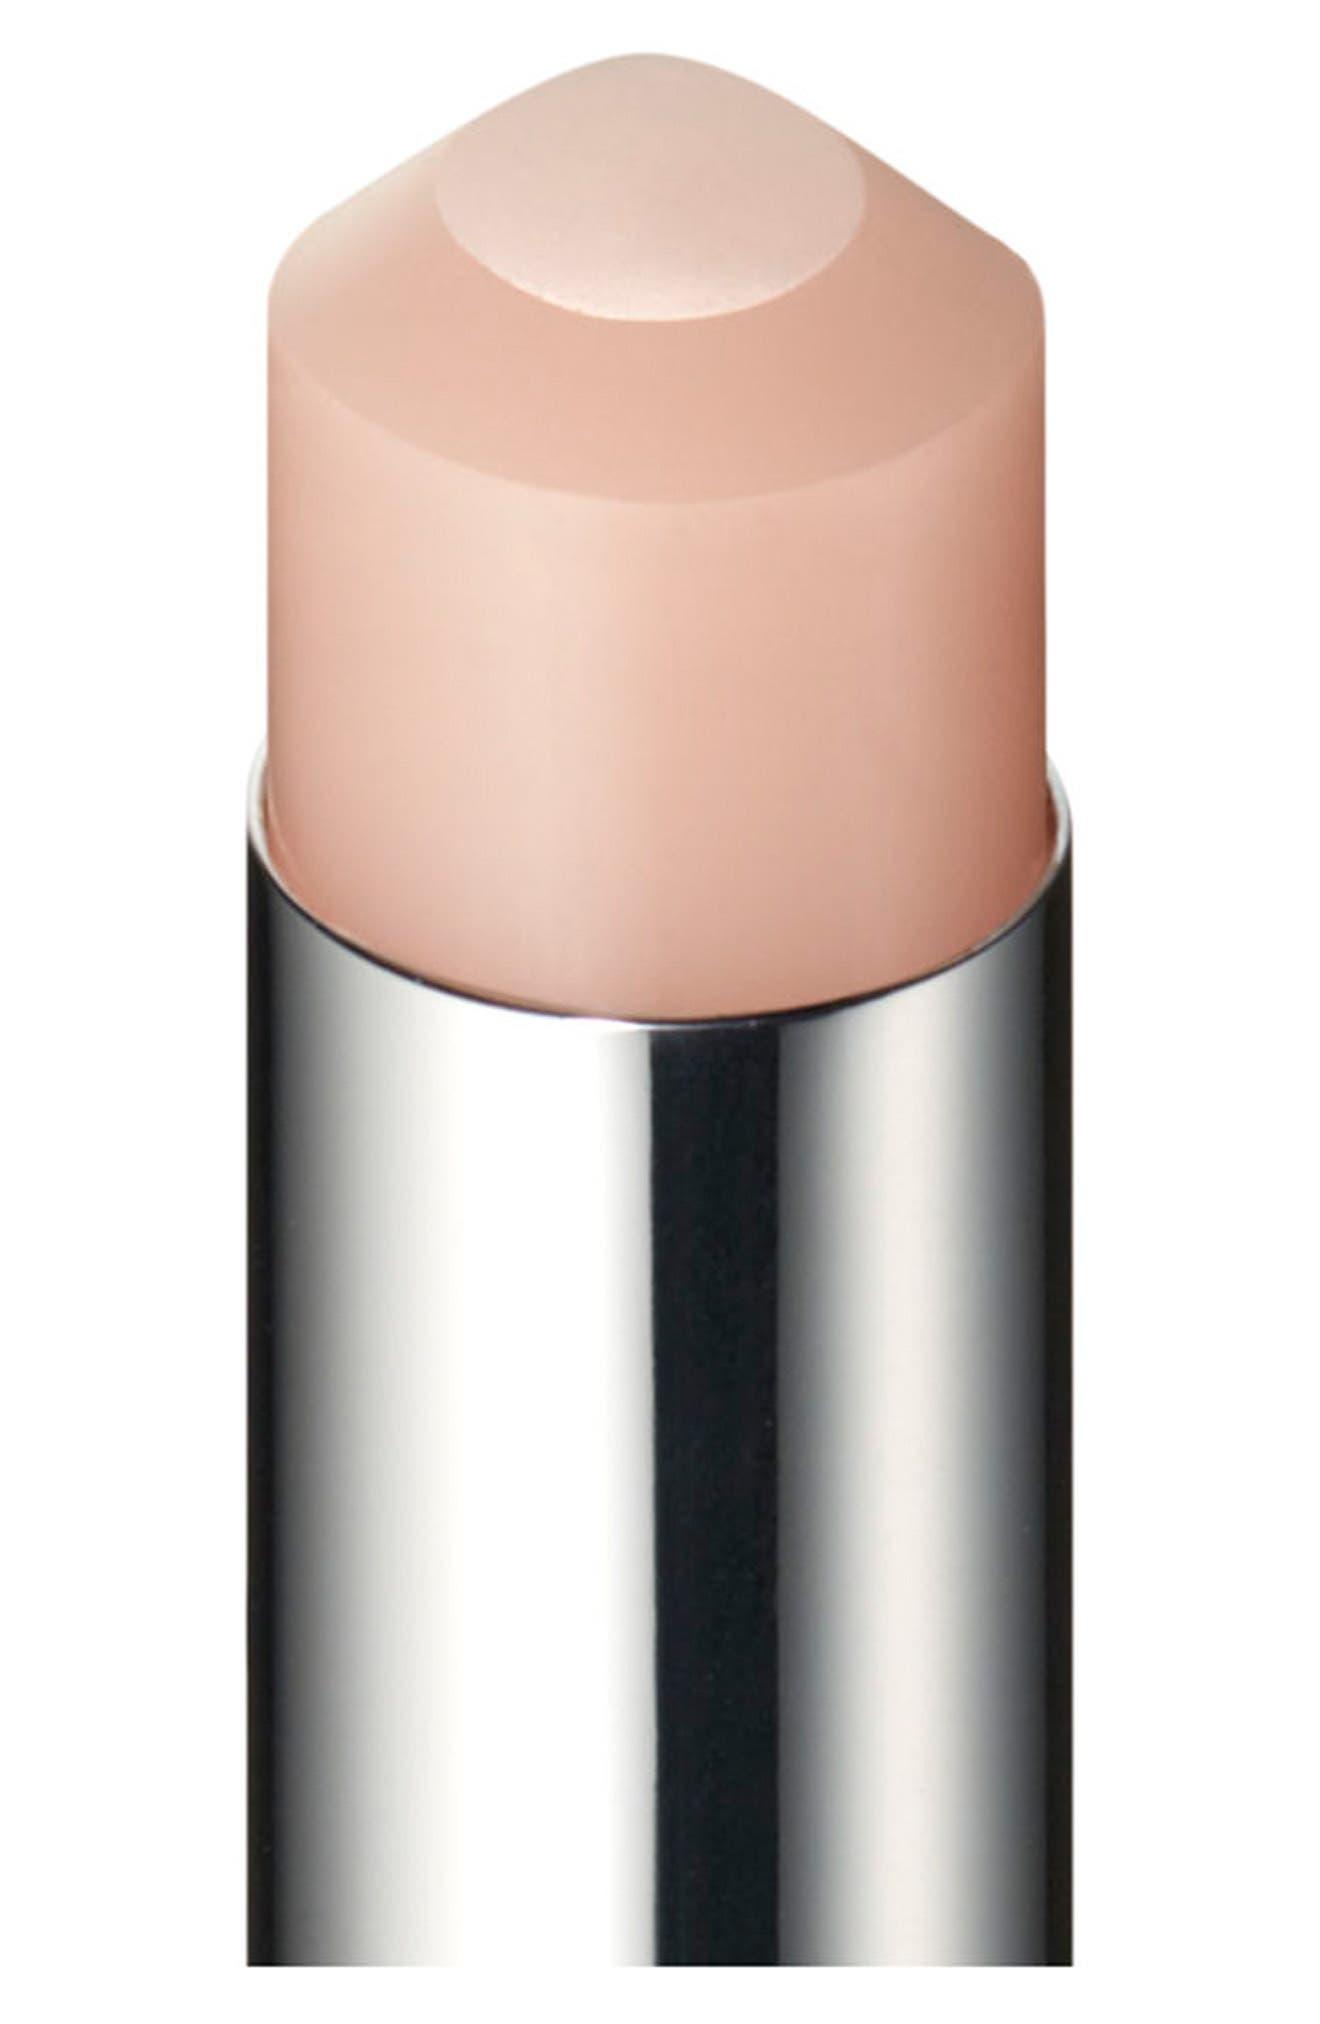 UV Protective Lip Treatment Broad Spectrum SPF 30,                             Alternate thumbnail 2, color,                             NO COLOR